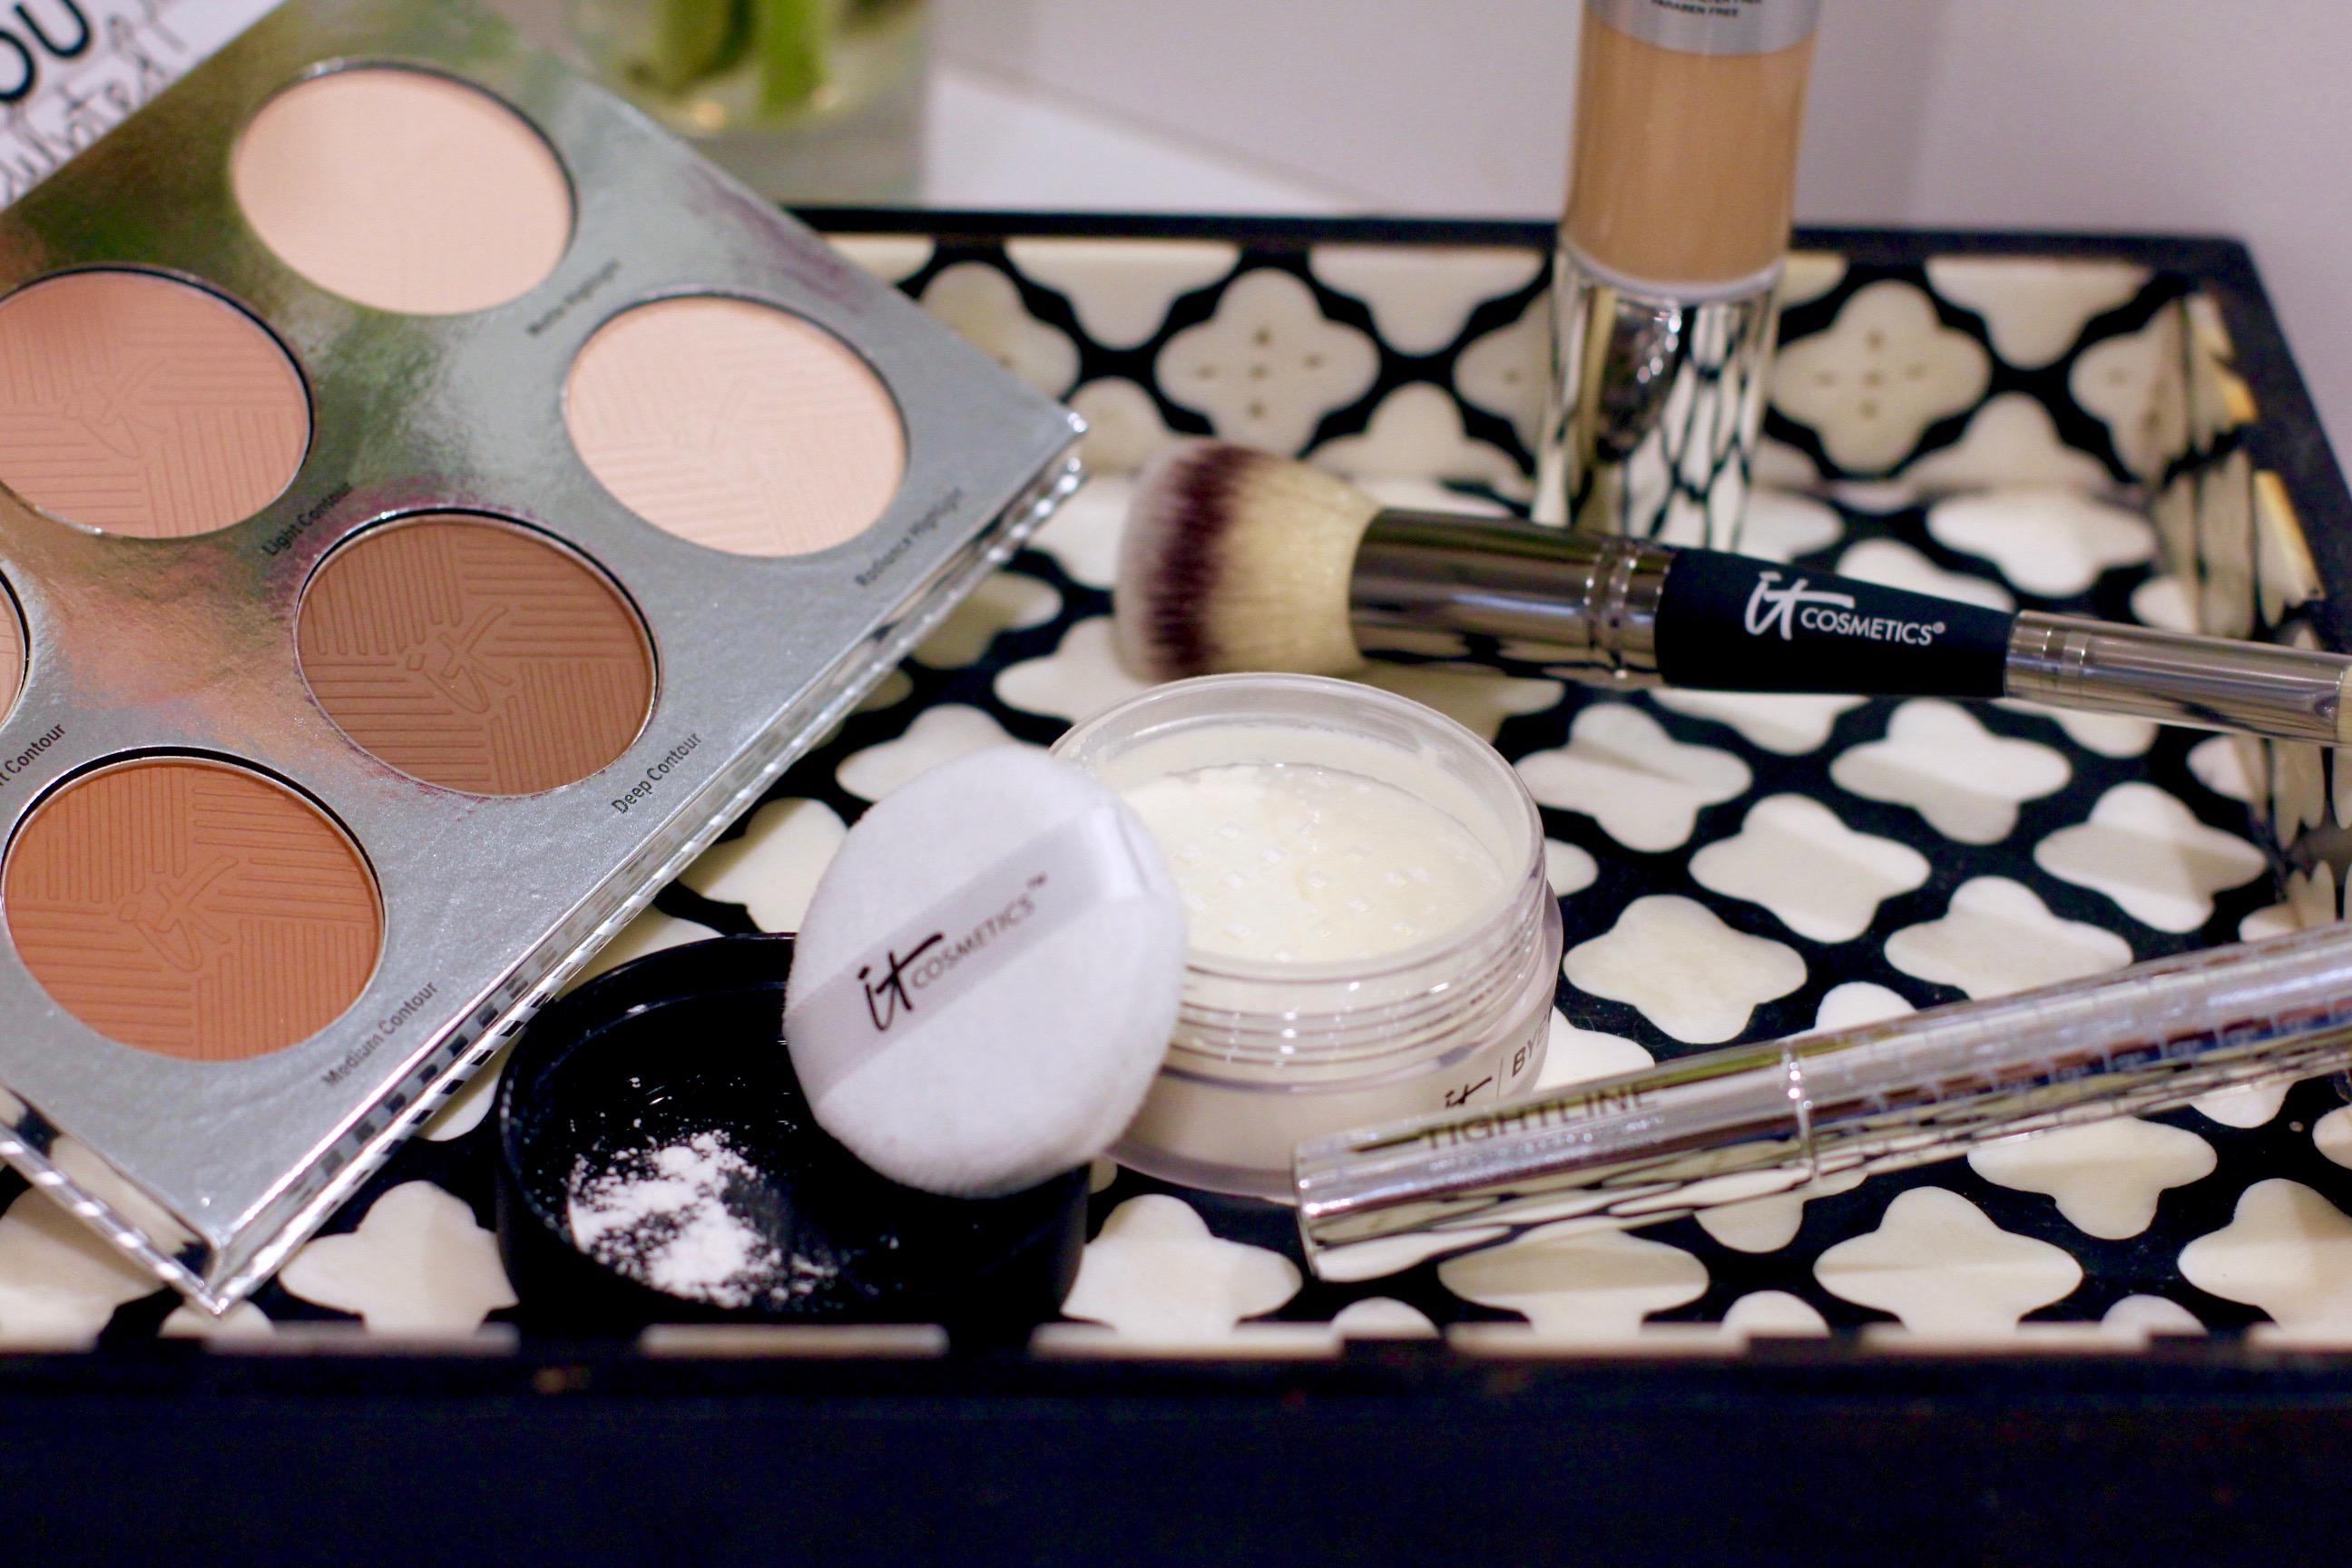 missyonmadison, melissa tierney, it cosmetics, ulta, ulta beauty, it cosmetics review, it cosmetics brushes, bye bye pores, pore powder, it cosmetics contour kit, contour kit, how to contour, cc cream, it cosmetics cc cream, it cosmetics tightline, it cosmetics mascara, beauty blog, beauty blogger, beauty review, beauty tutorial,